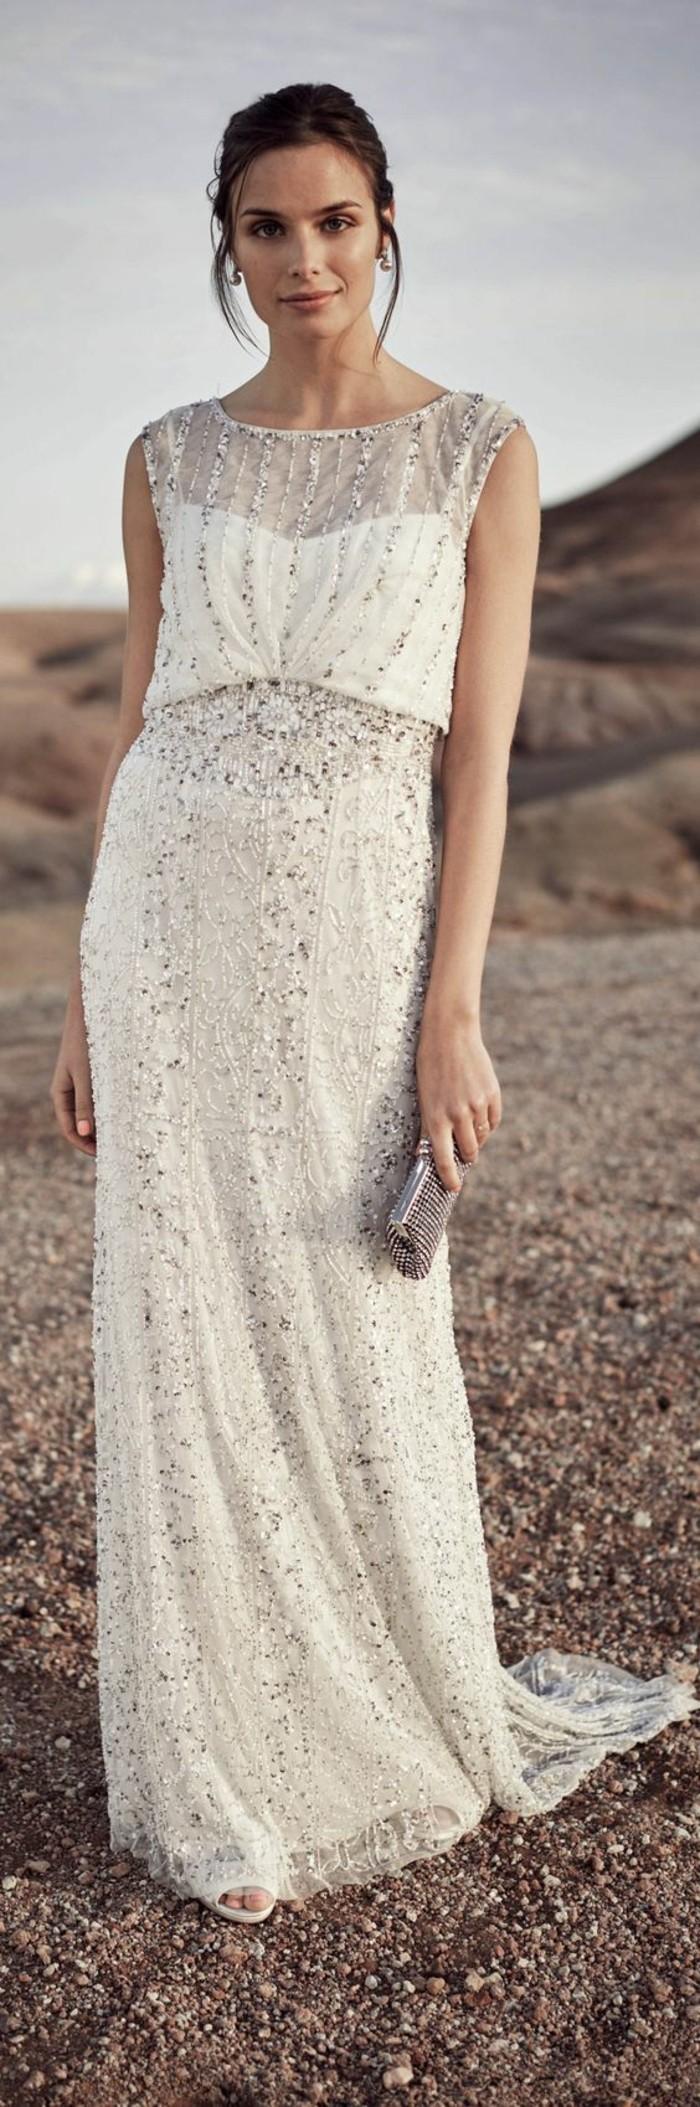 paillettenkleid boho stil hochzeitskleid lang sommer ideen